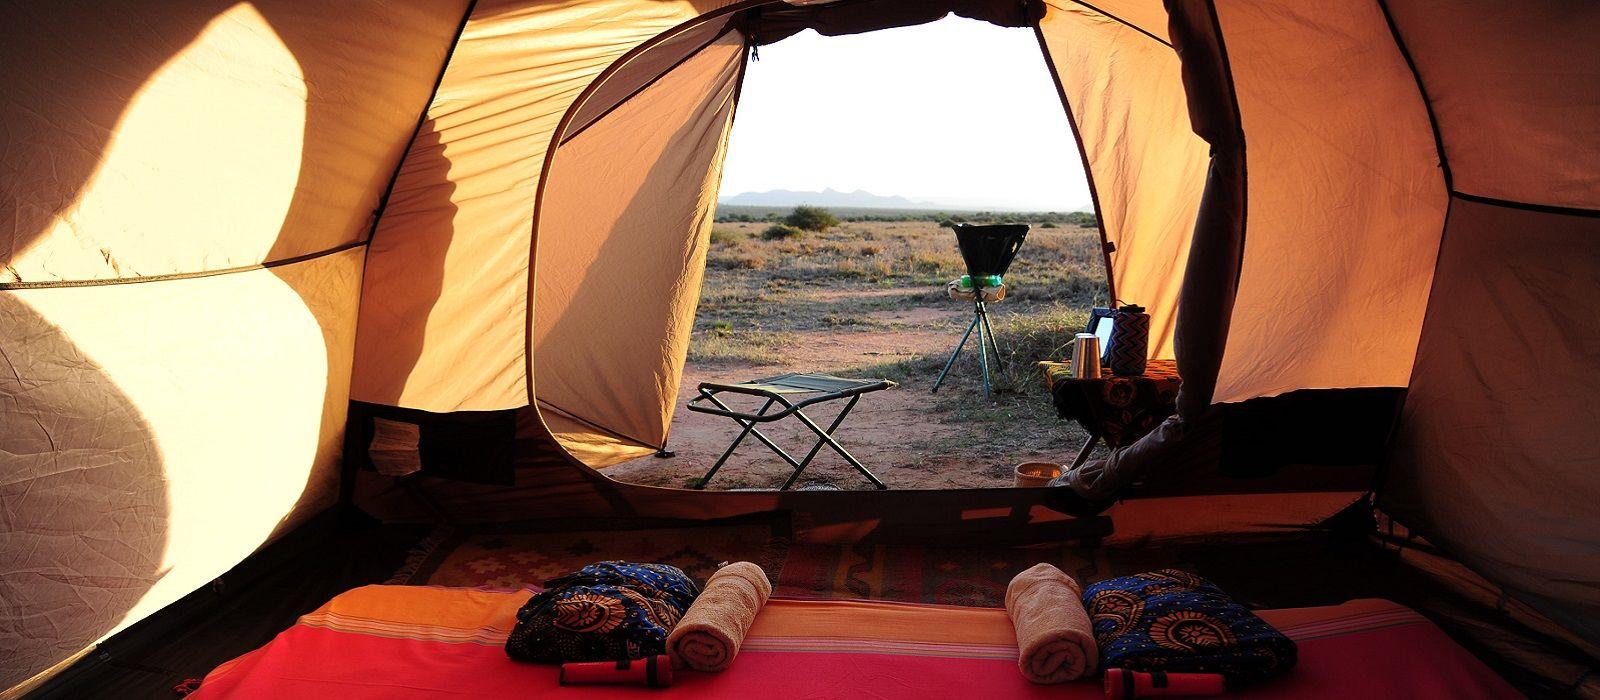 Hotel Karisia Expedition Mobile Camp Kenya